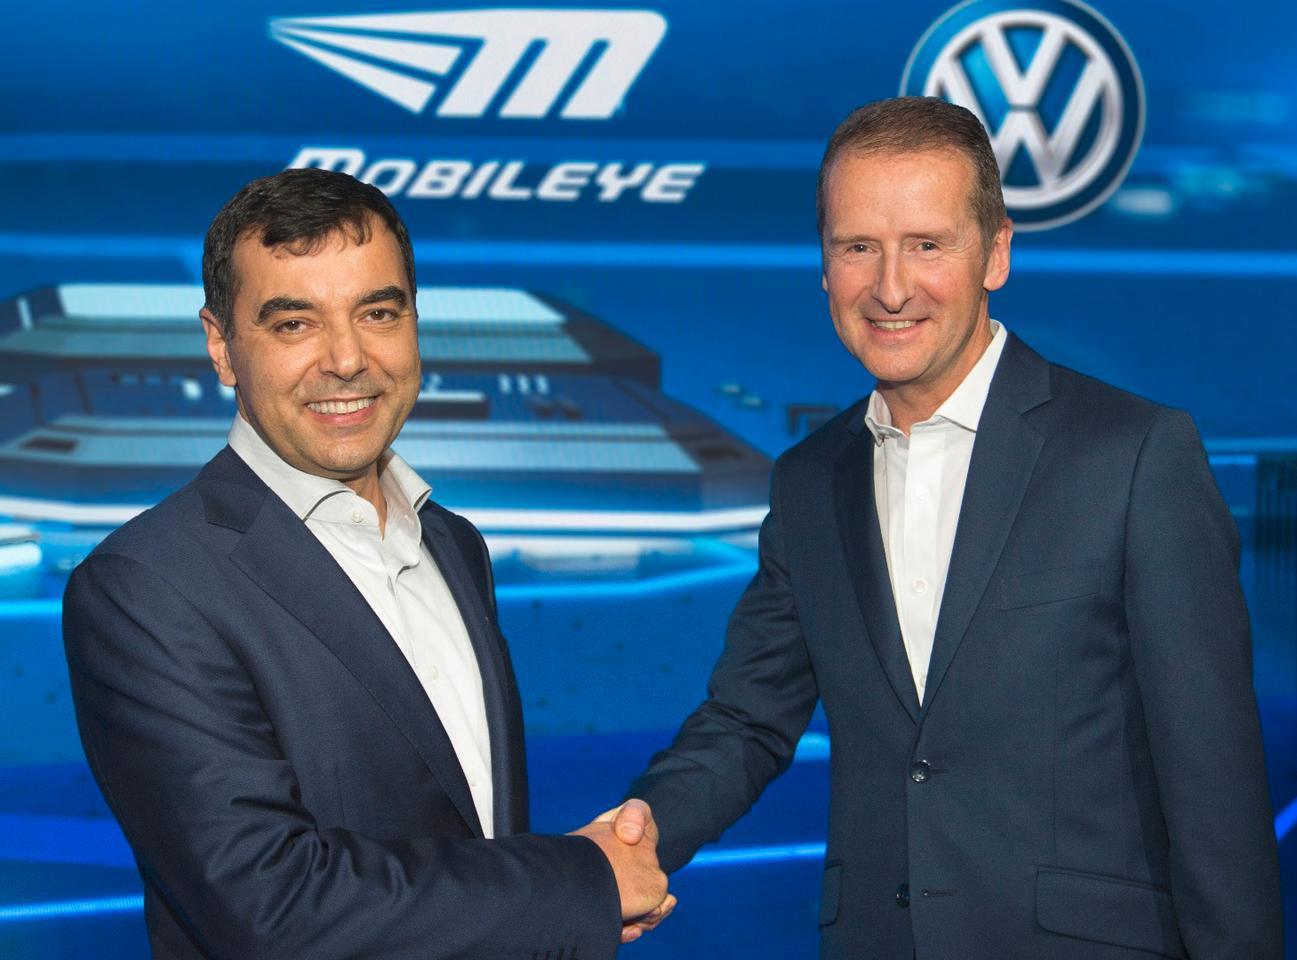 Left to right: Prof. Amnon Shashua (Chairman Mobileye) and Dr. Herbert Diess (Chairman Volkswagen brand)